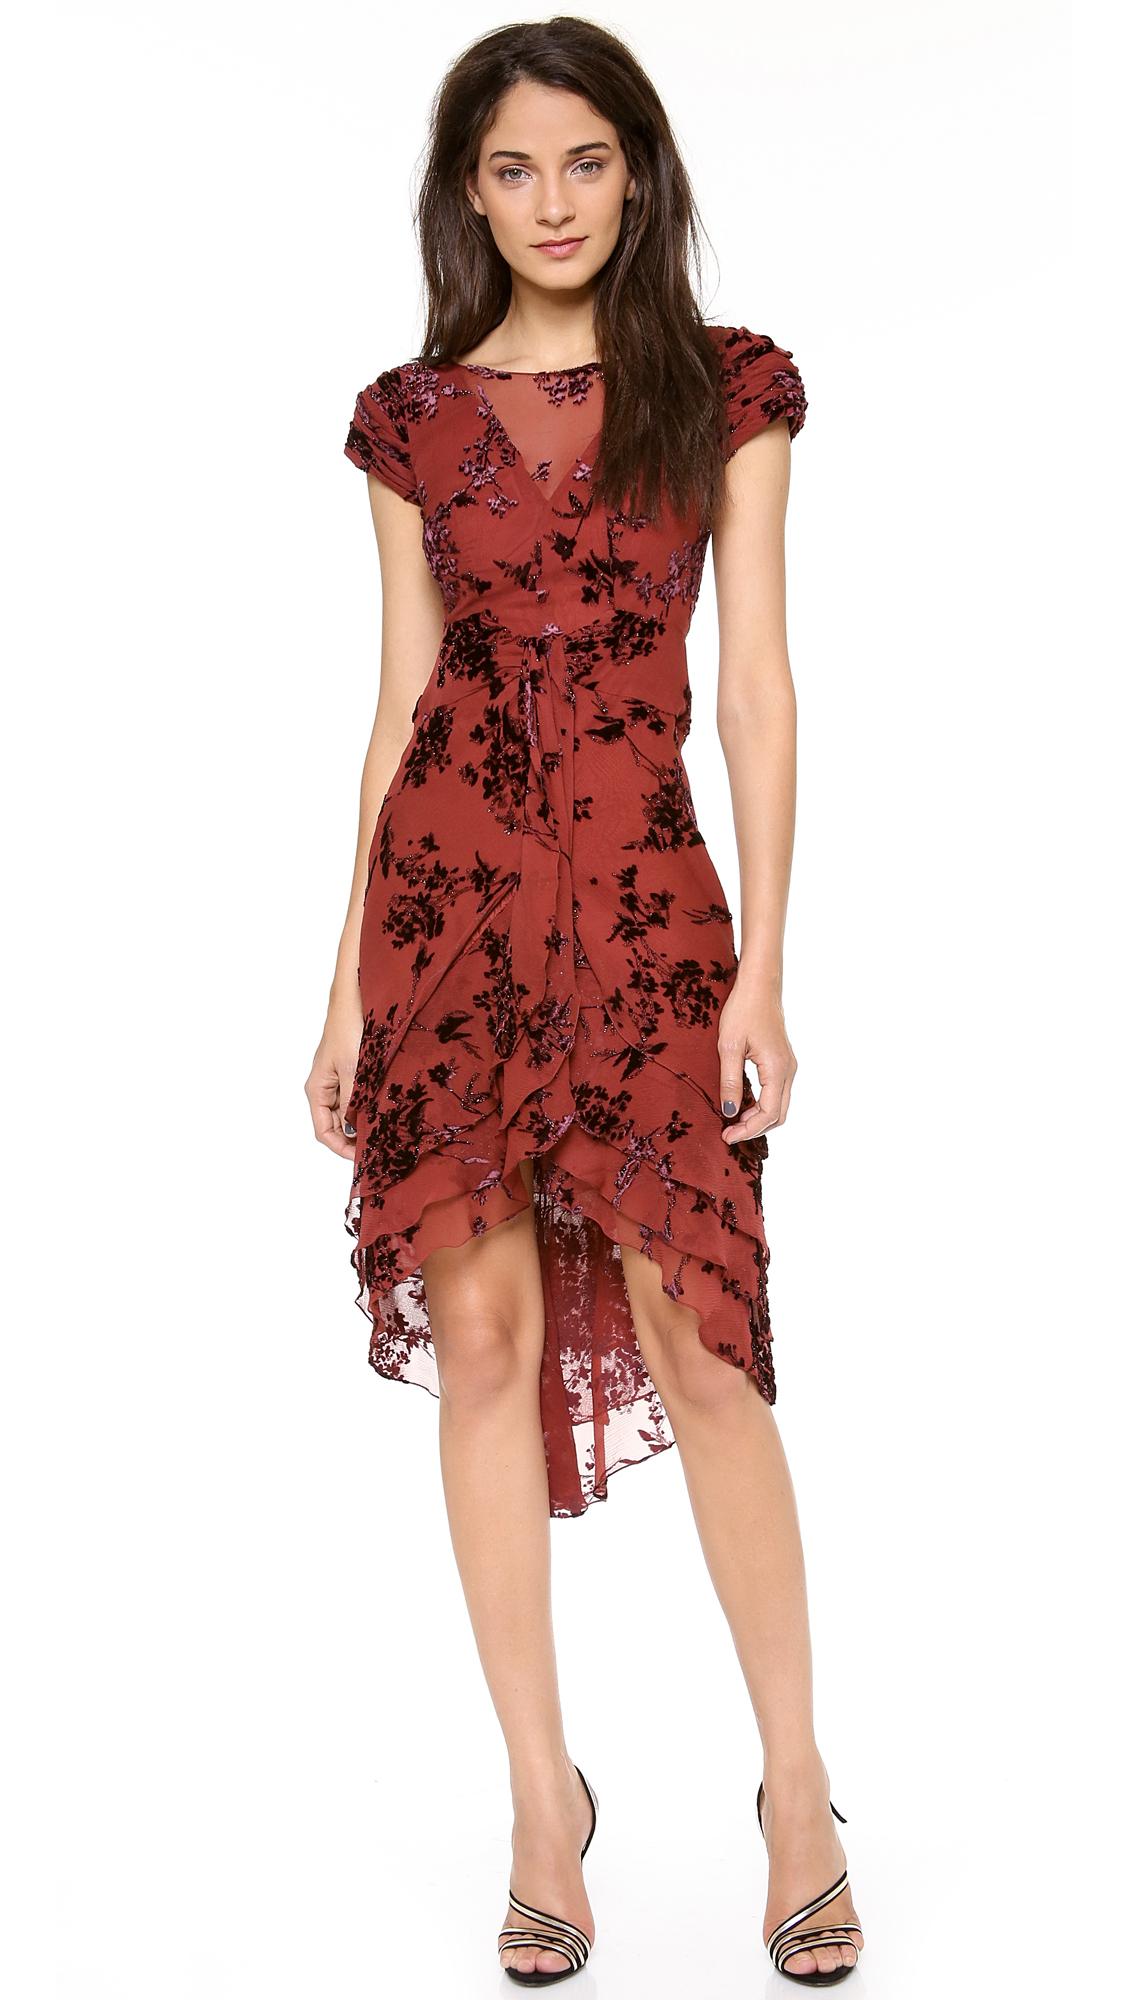 Zac posen Silk Short Sleeve Dress in Brown - Lyst